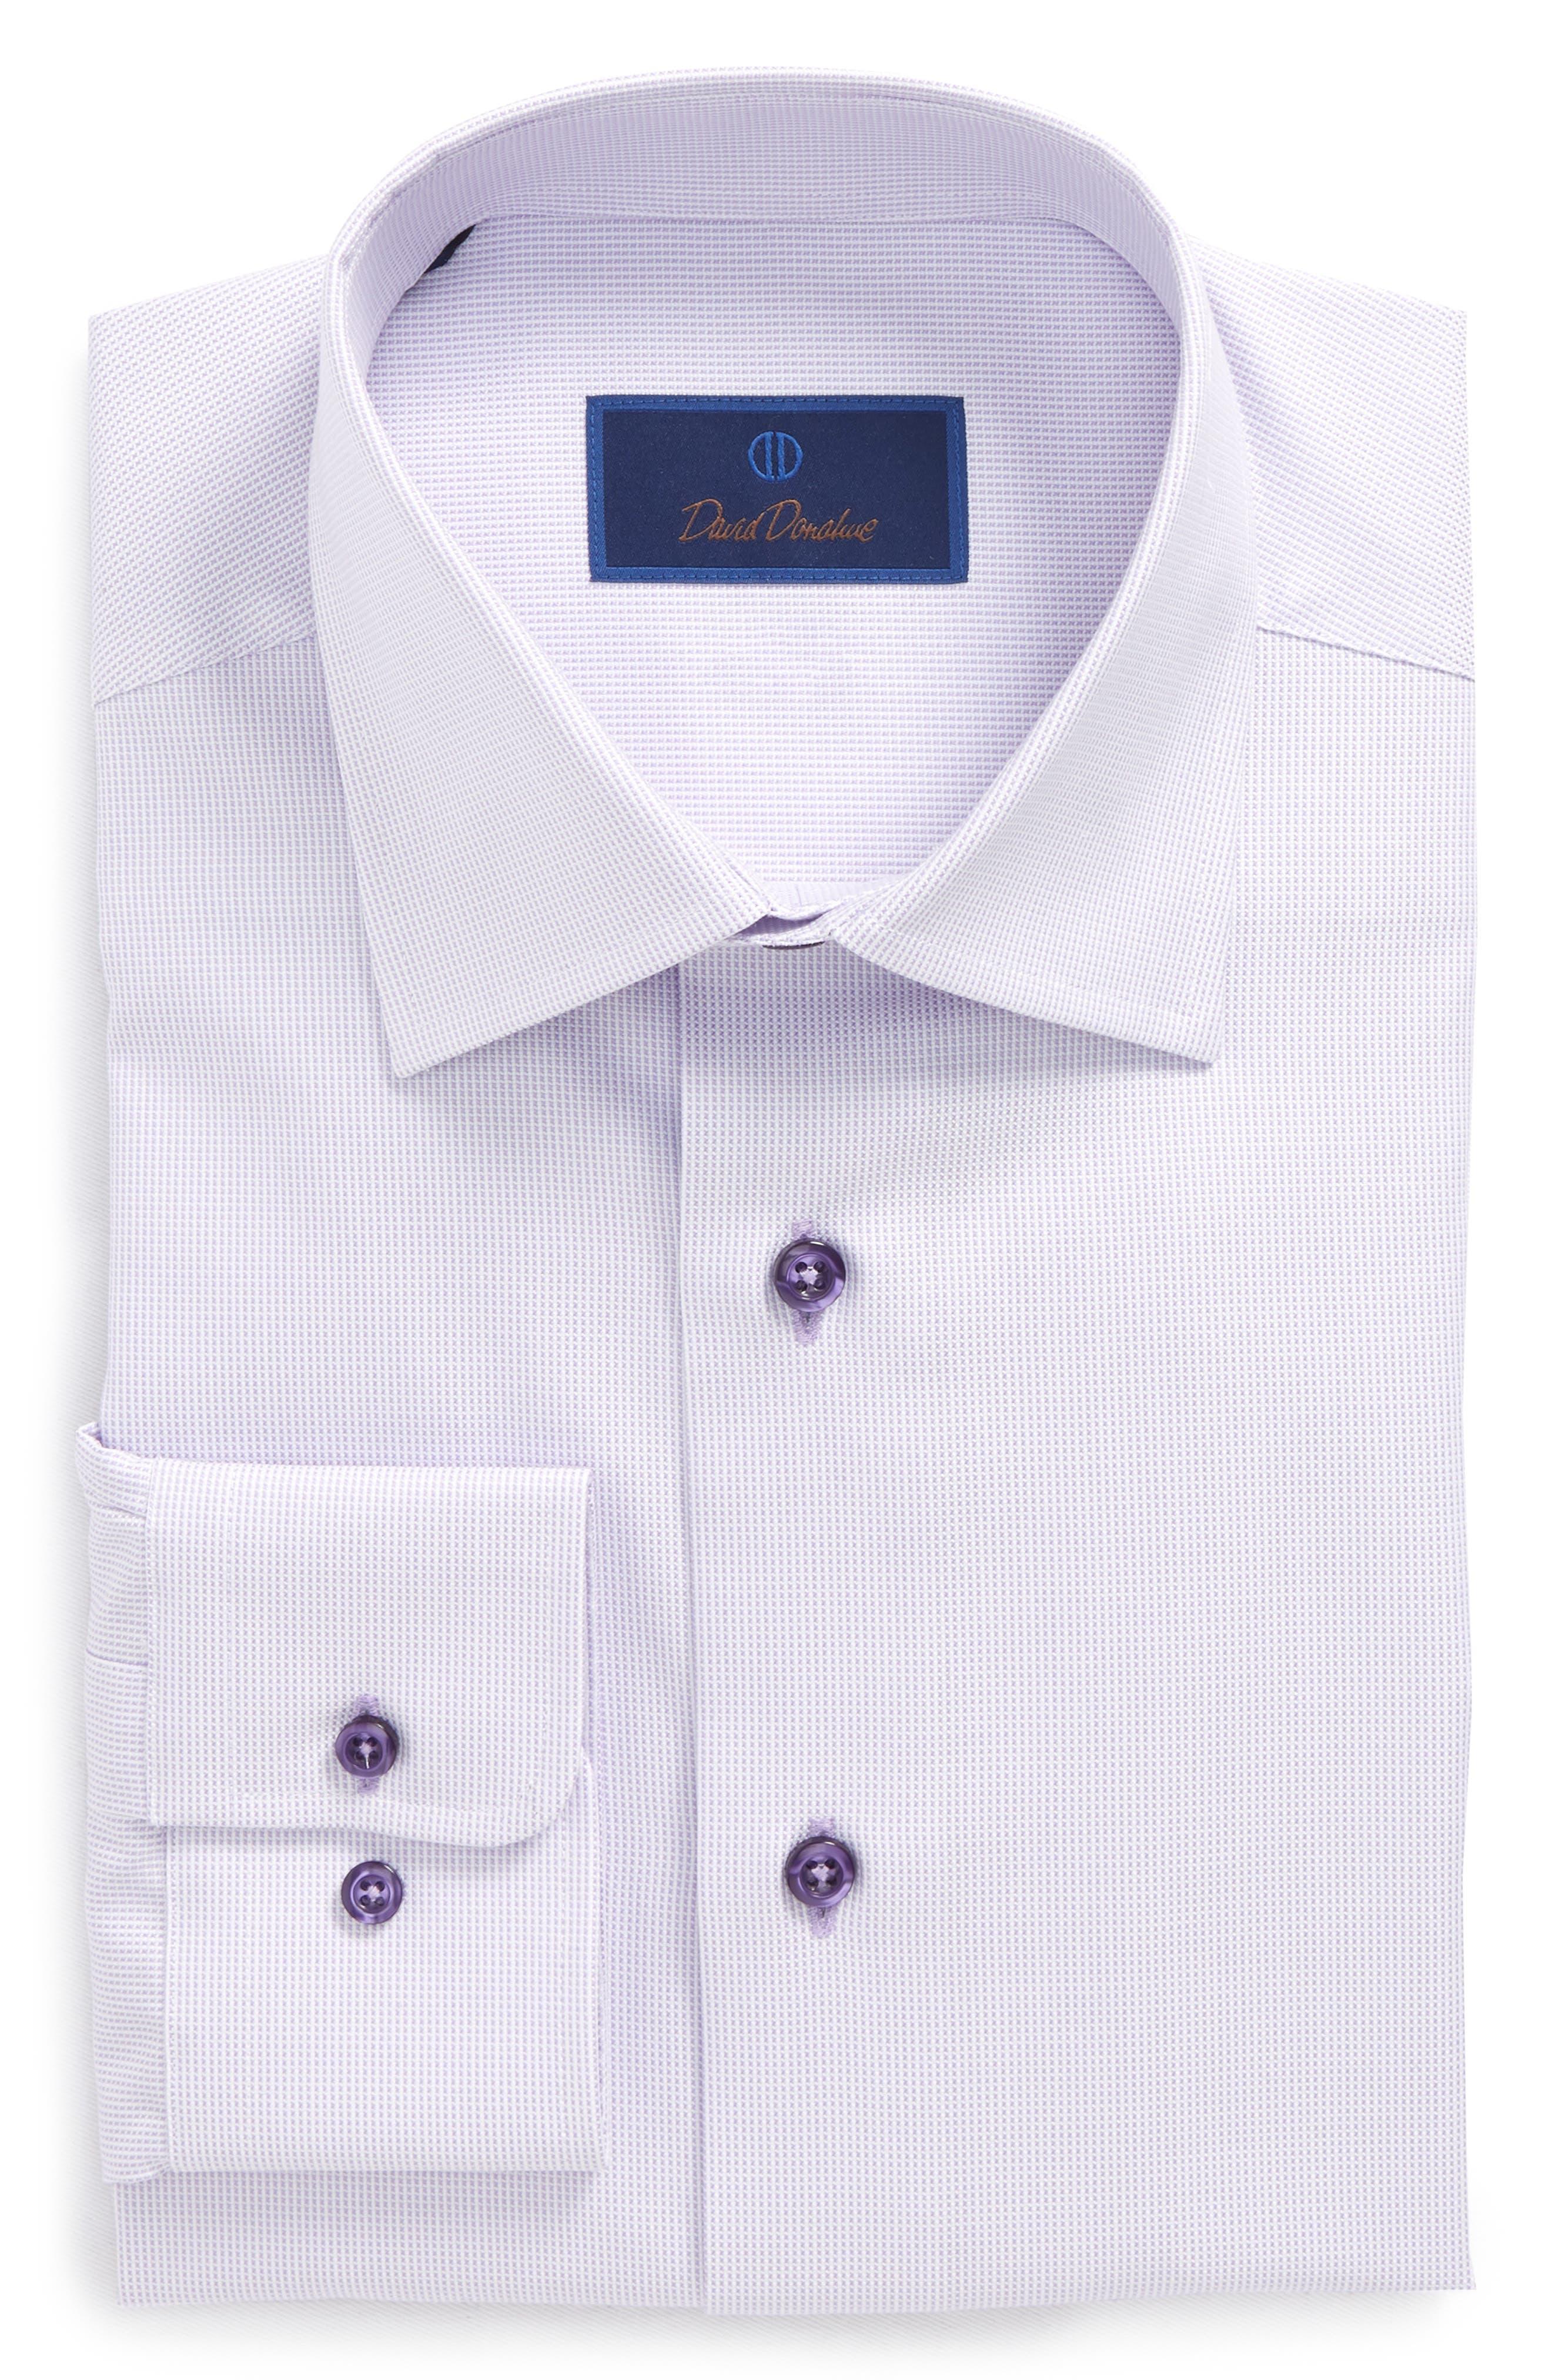 Regular Fit Solid Dress Shirt,                             Alternate thumbnail 6, color,                             Lilac